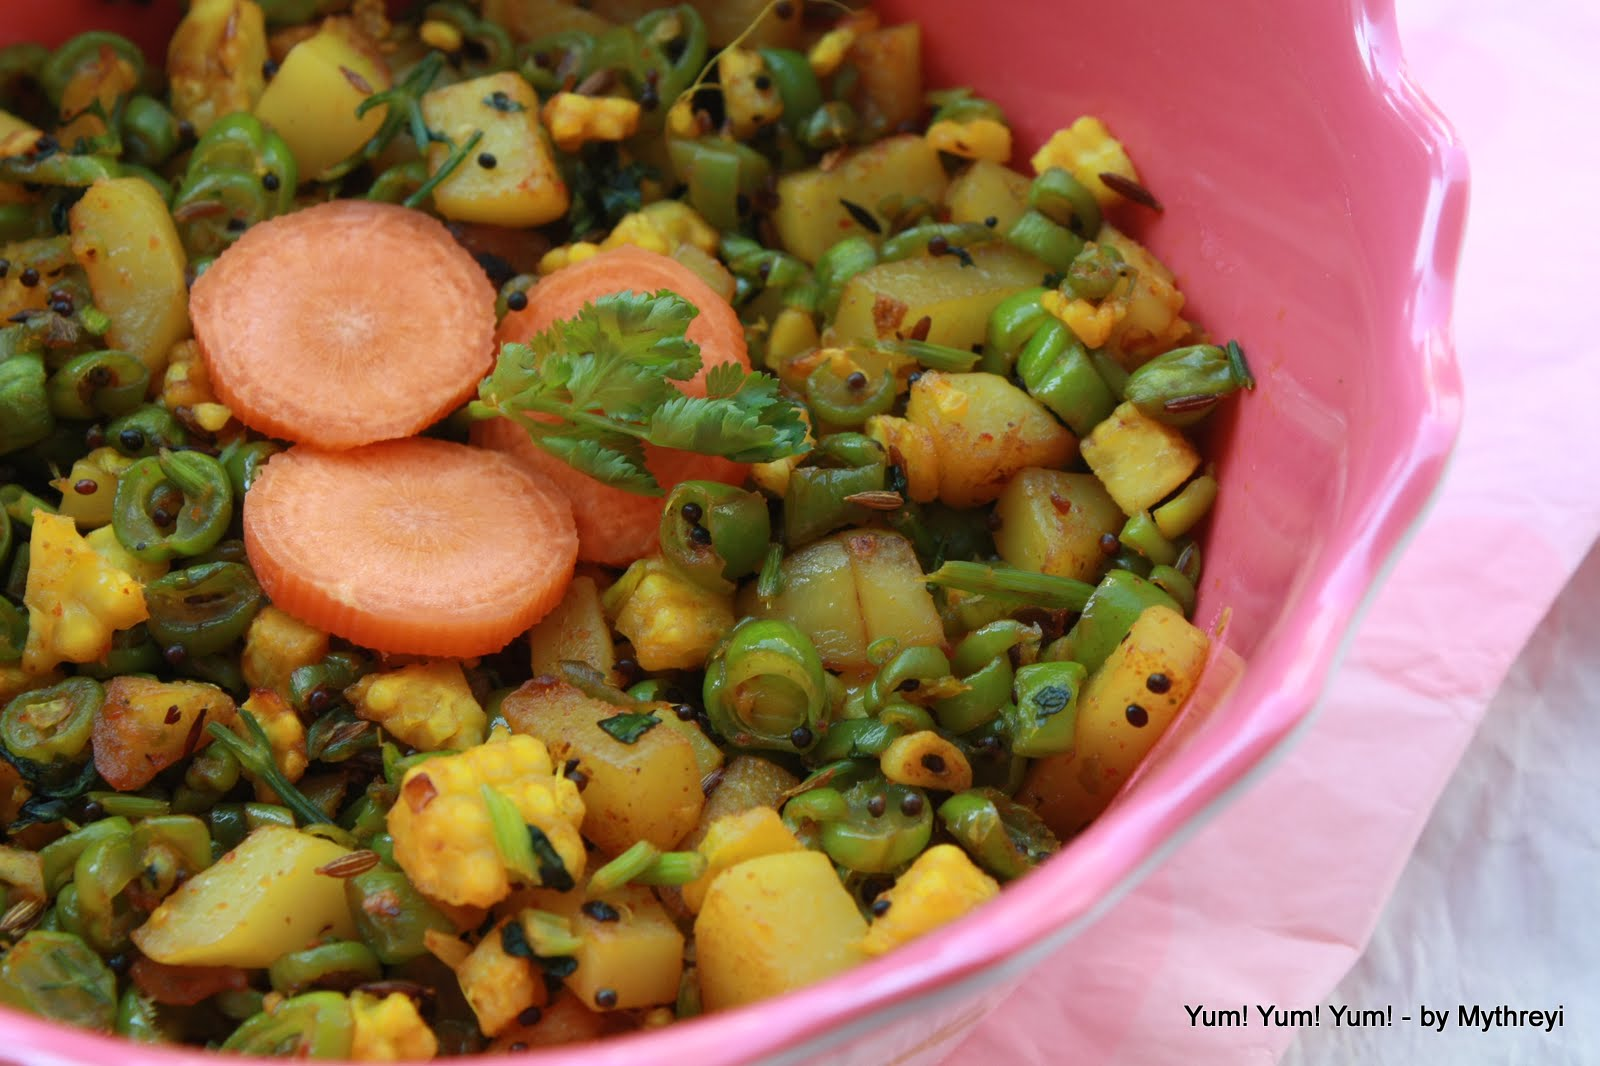 Yum! Yum! Yum!: Potato, Green Bean, Baby Corn Stir Fry - photo#35